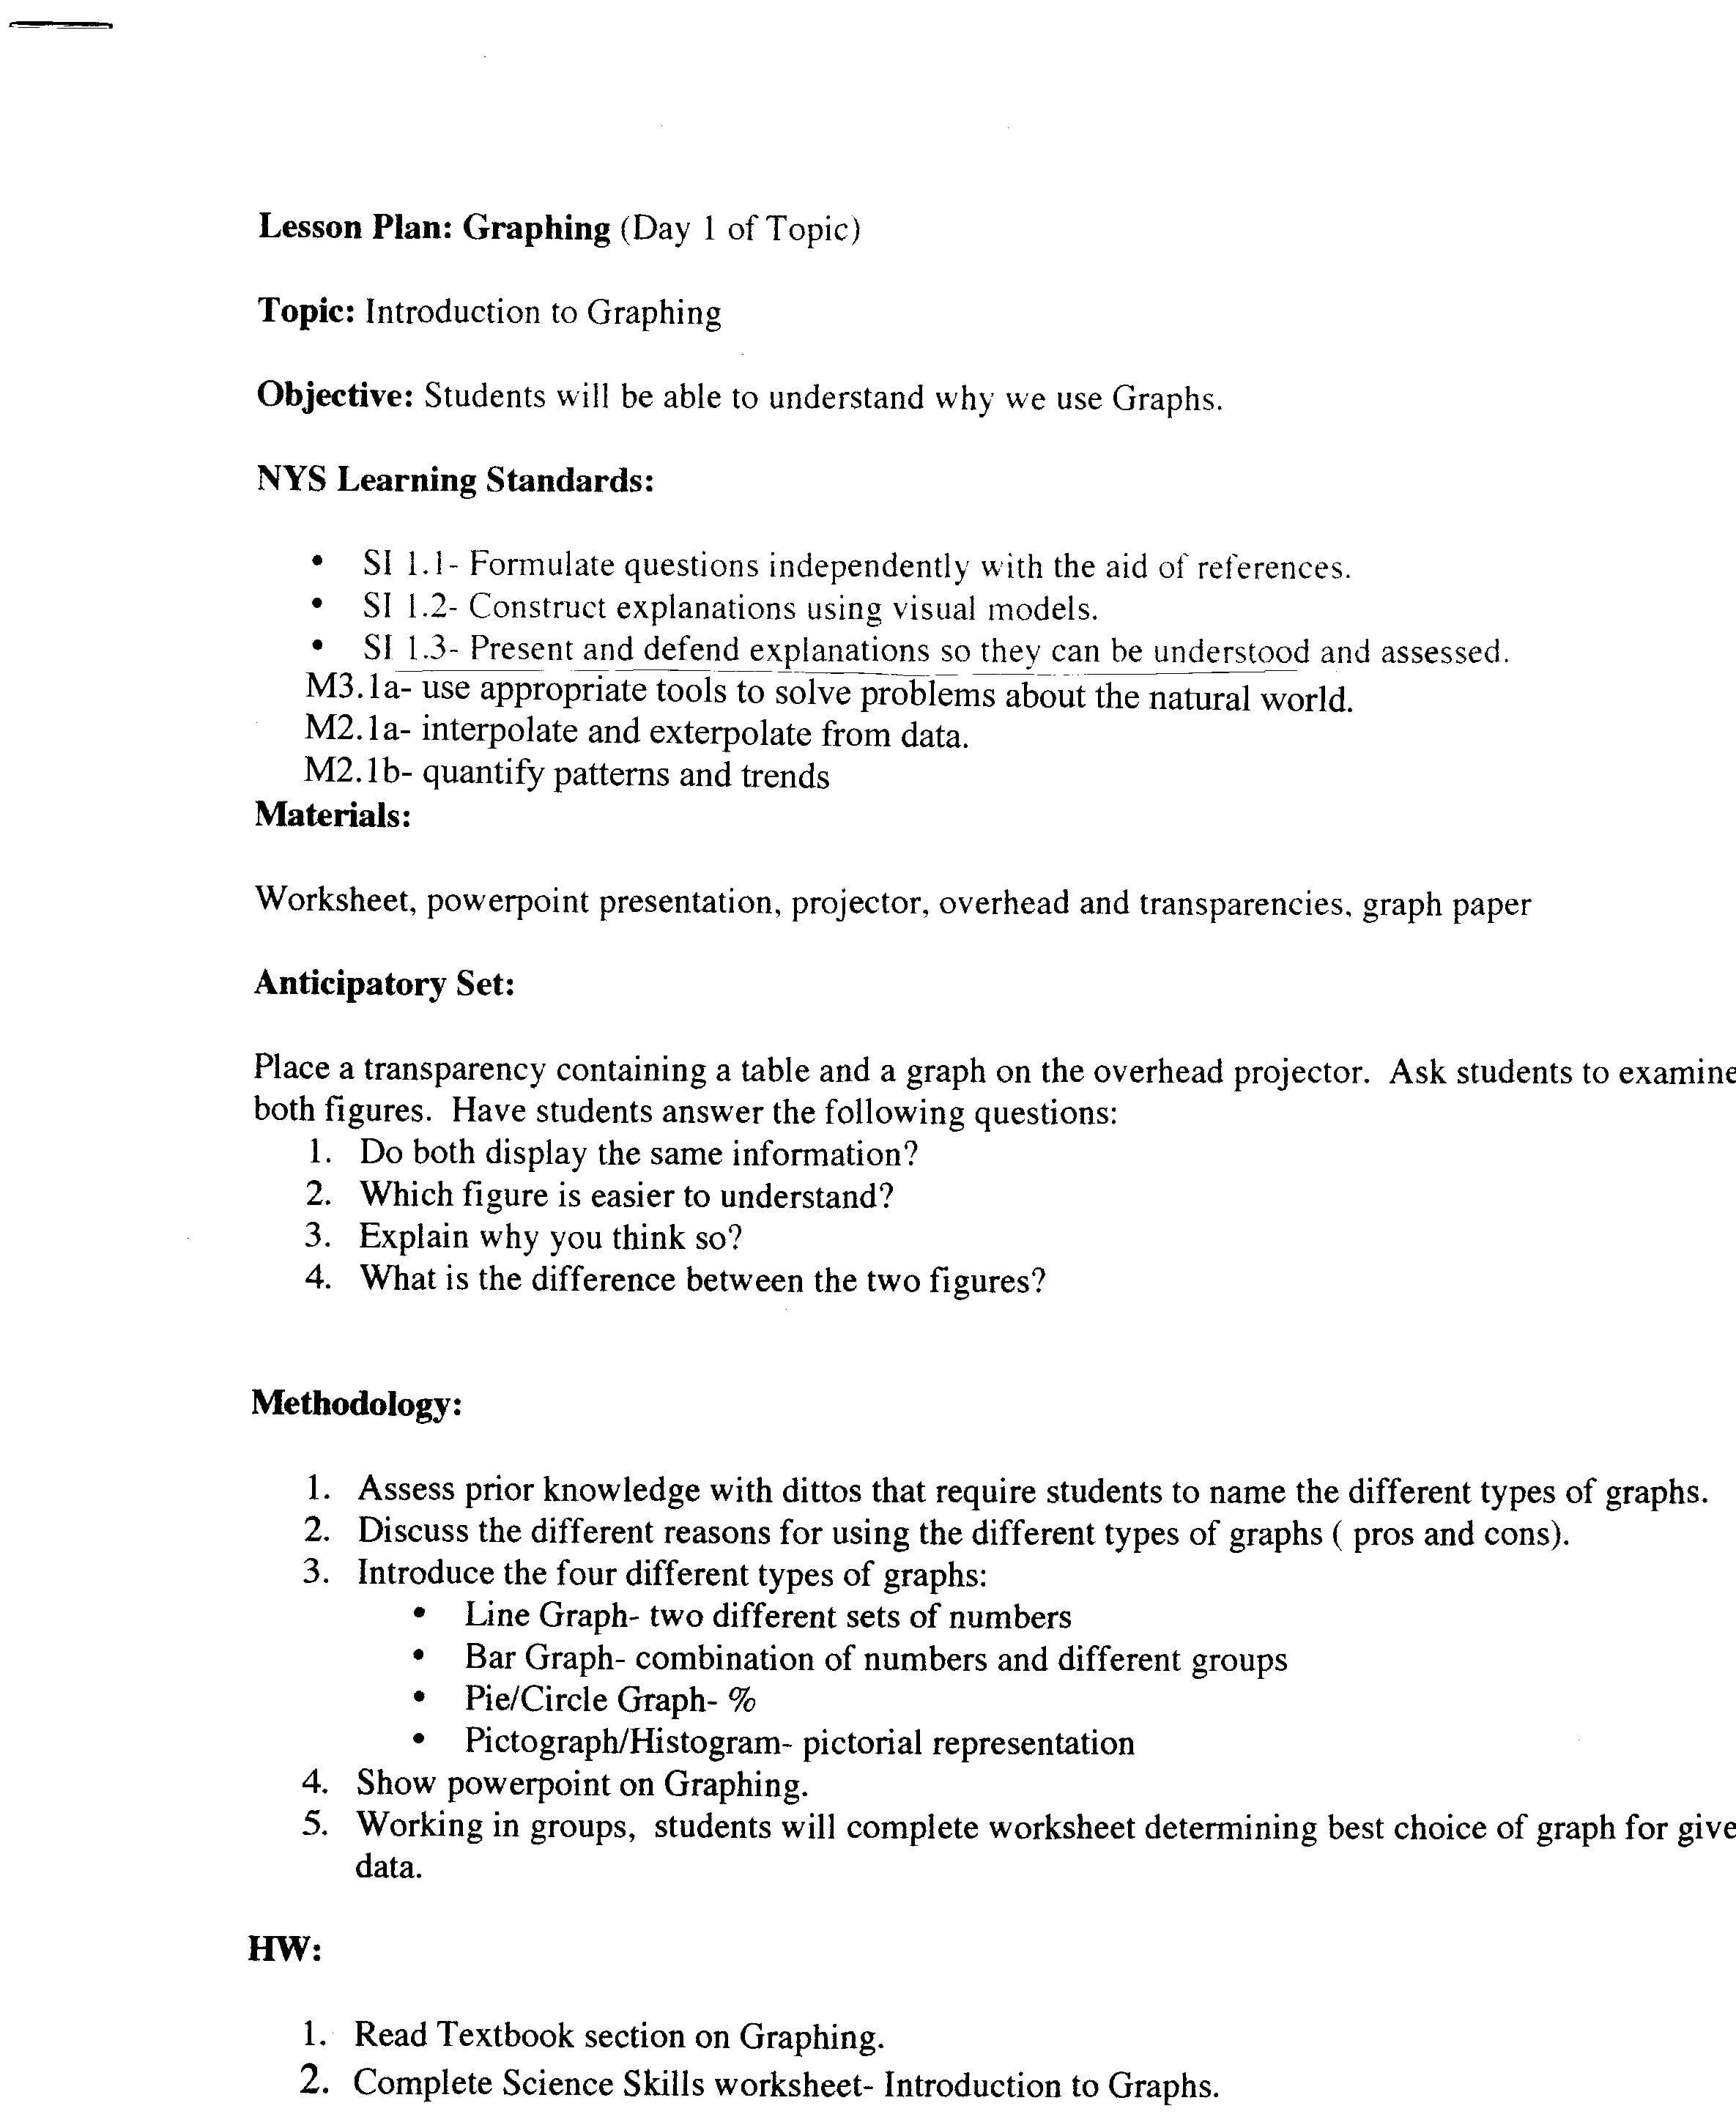 Science Skills For Science Skills Worksheet Answer Key